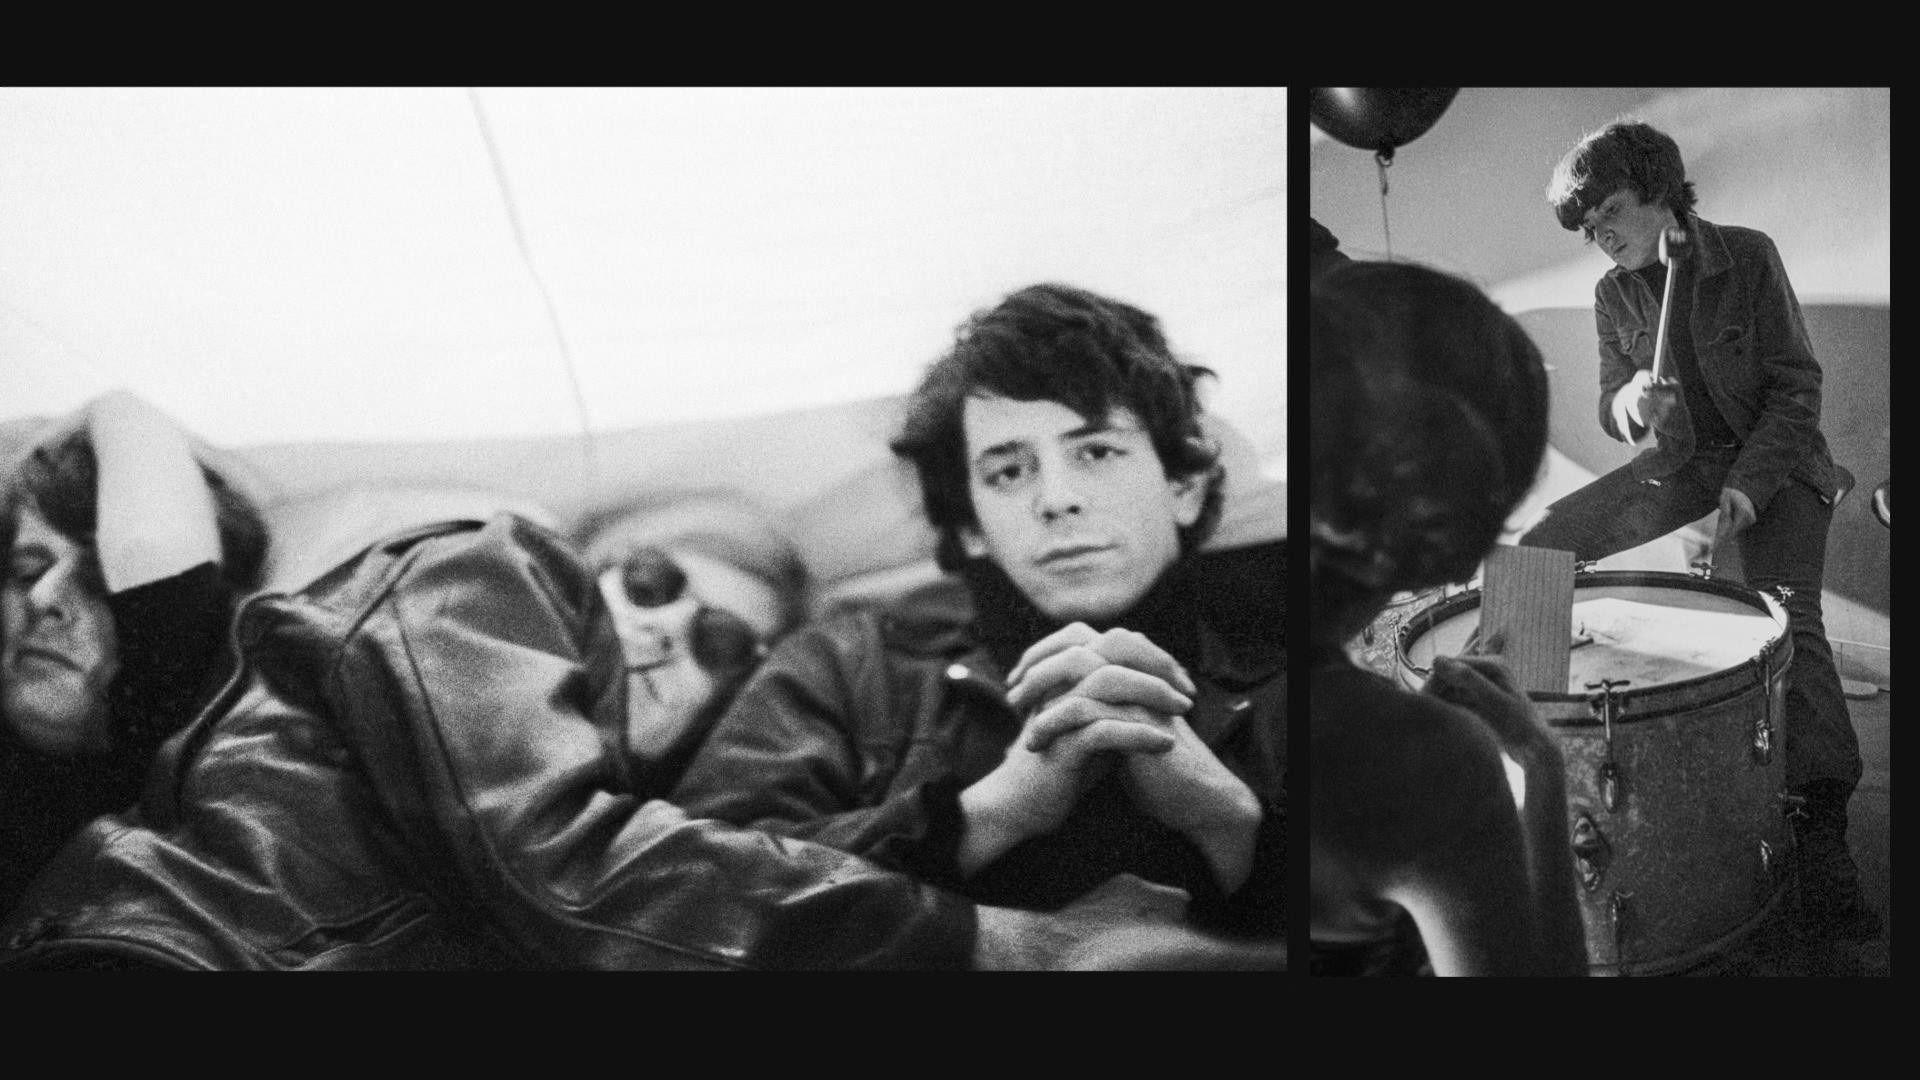 Paul Morrissey, Andy Warhol, Lou Reed e Moe Tucker